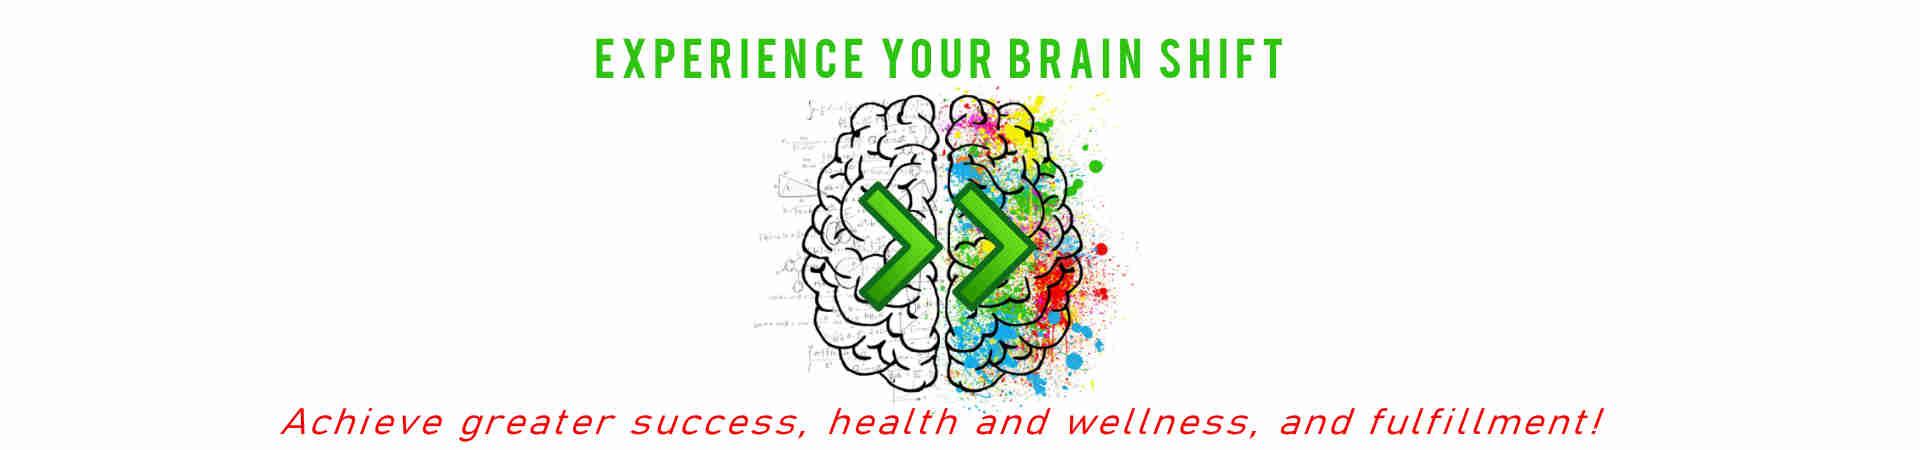 Your Brain Shift